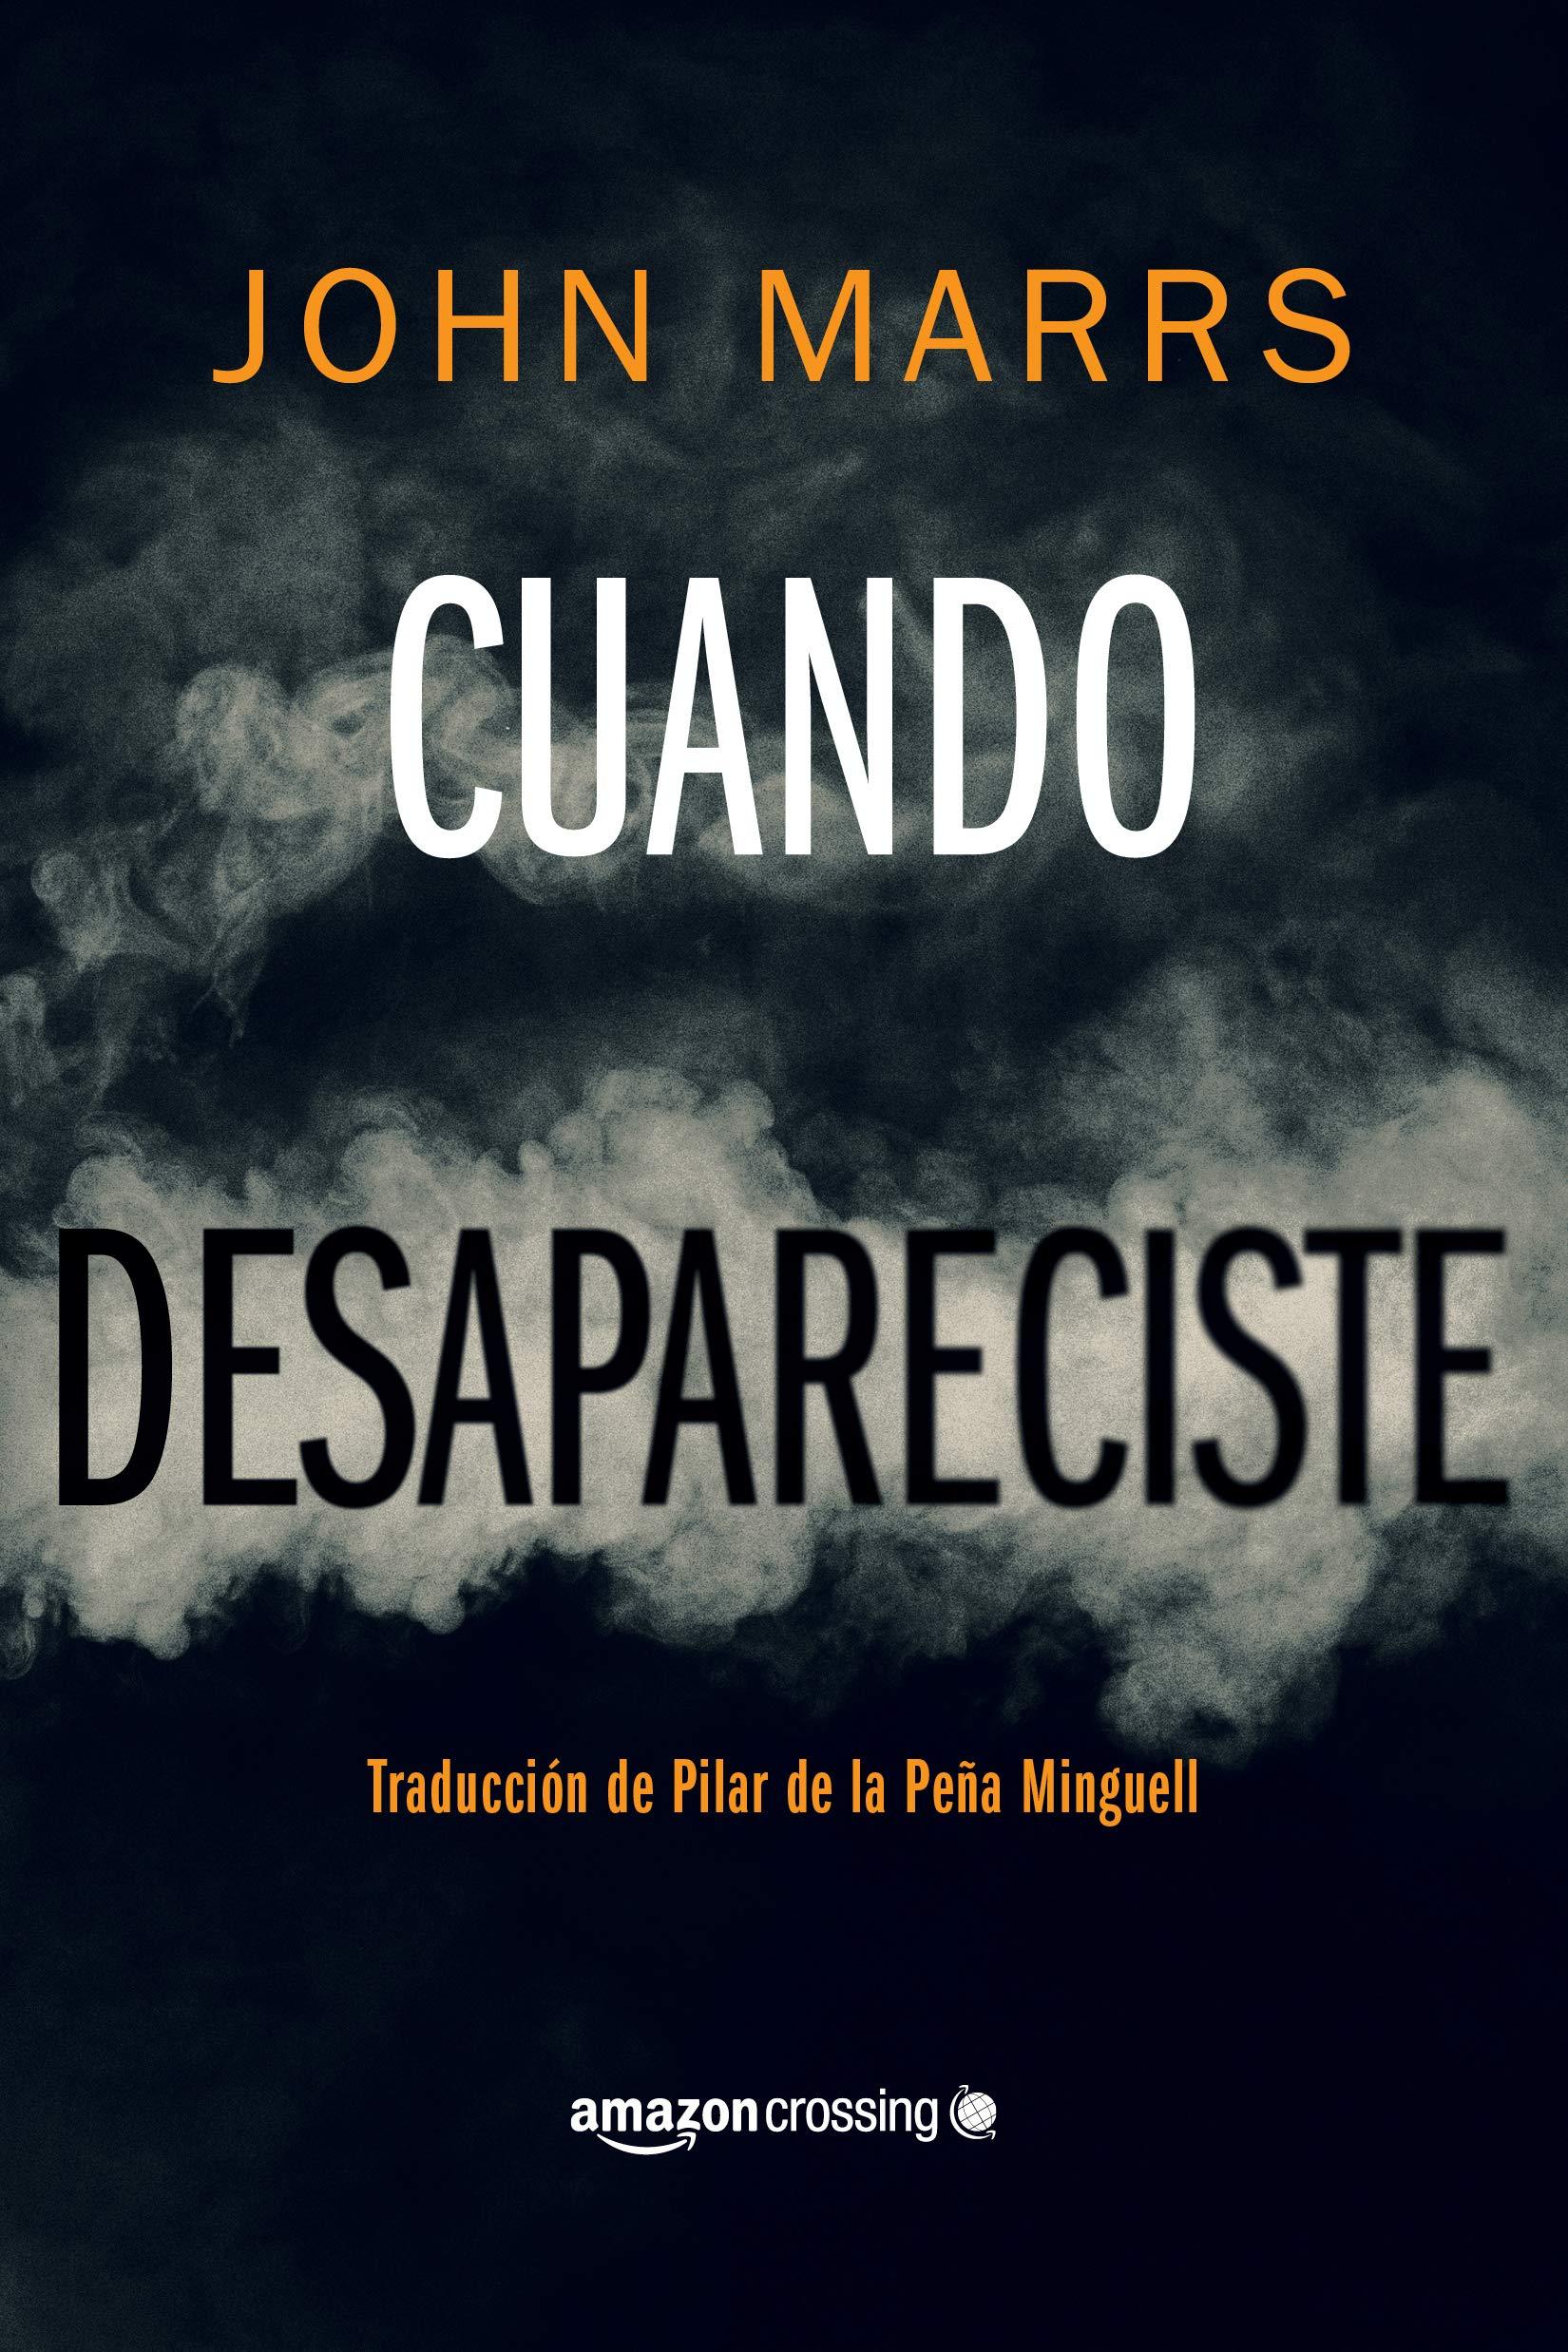 Cuando desapareciste (Spanish Edition): John Marrs, Pilar de la Peña Minguell: 9782919805716: Amazon.com: Books